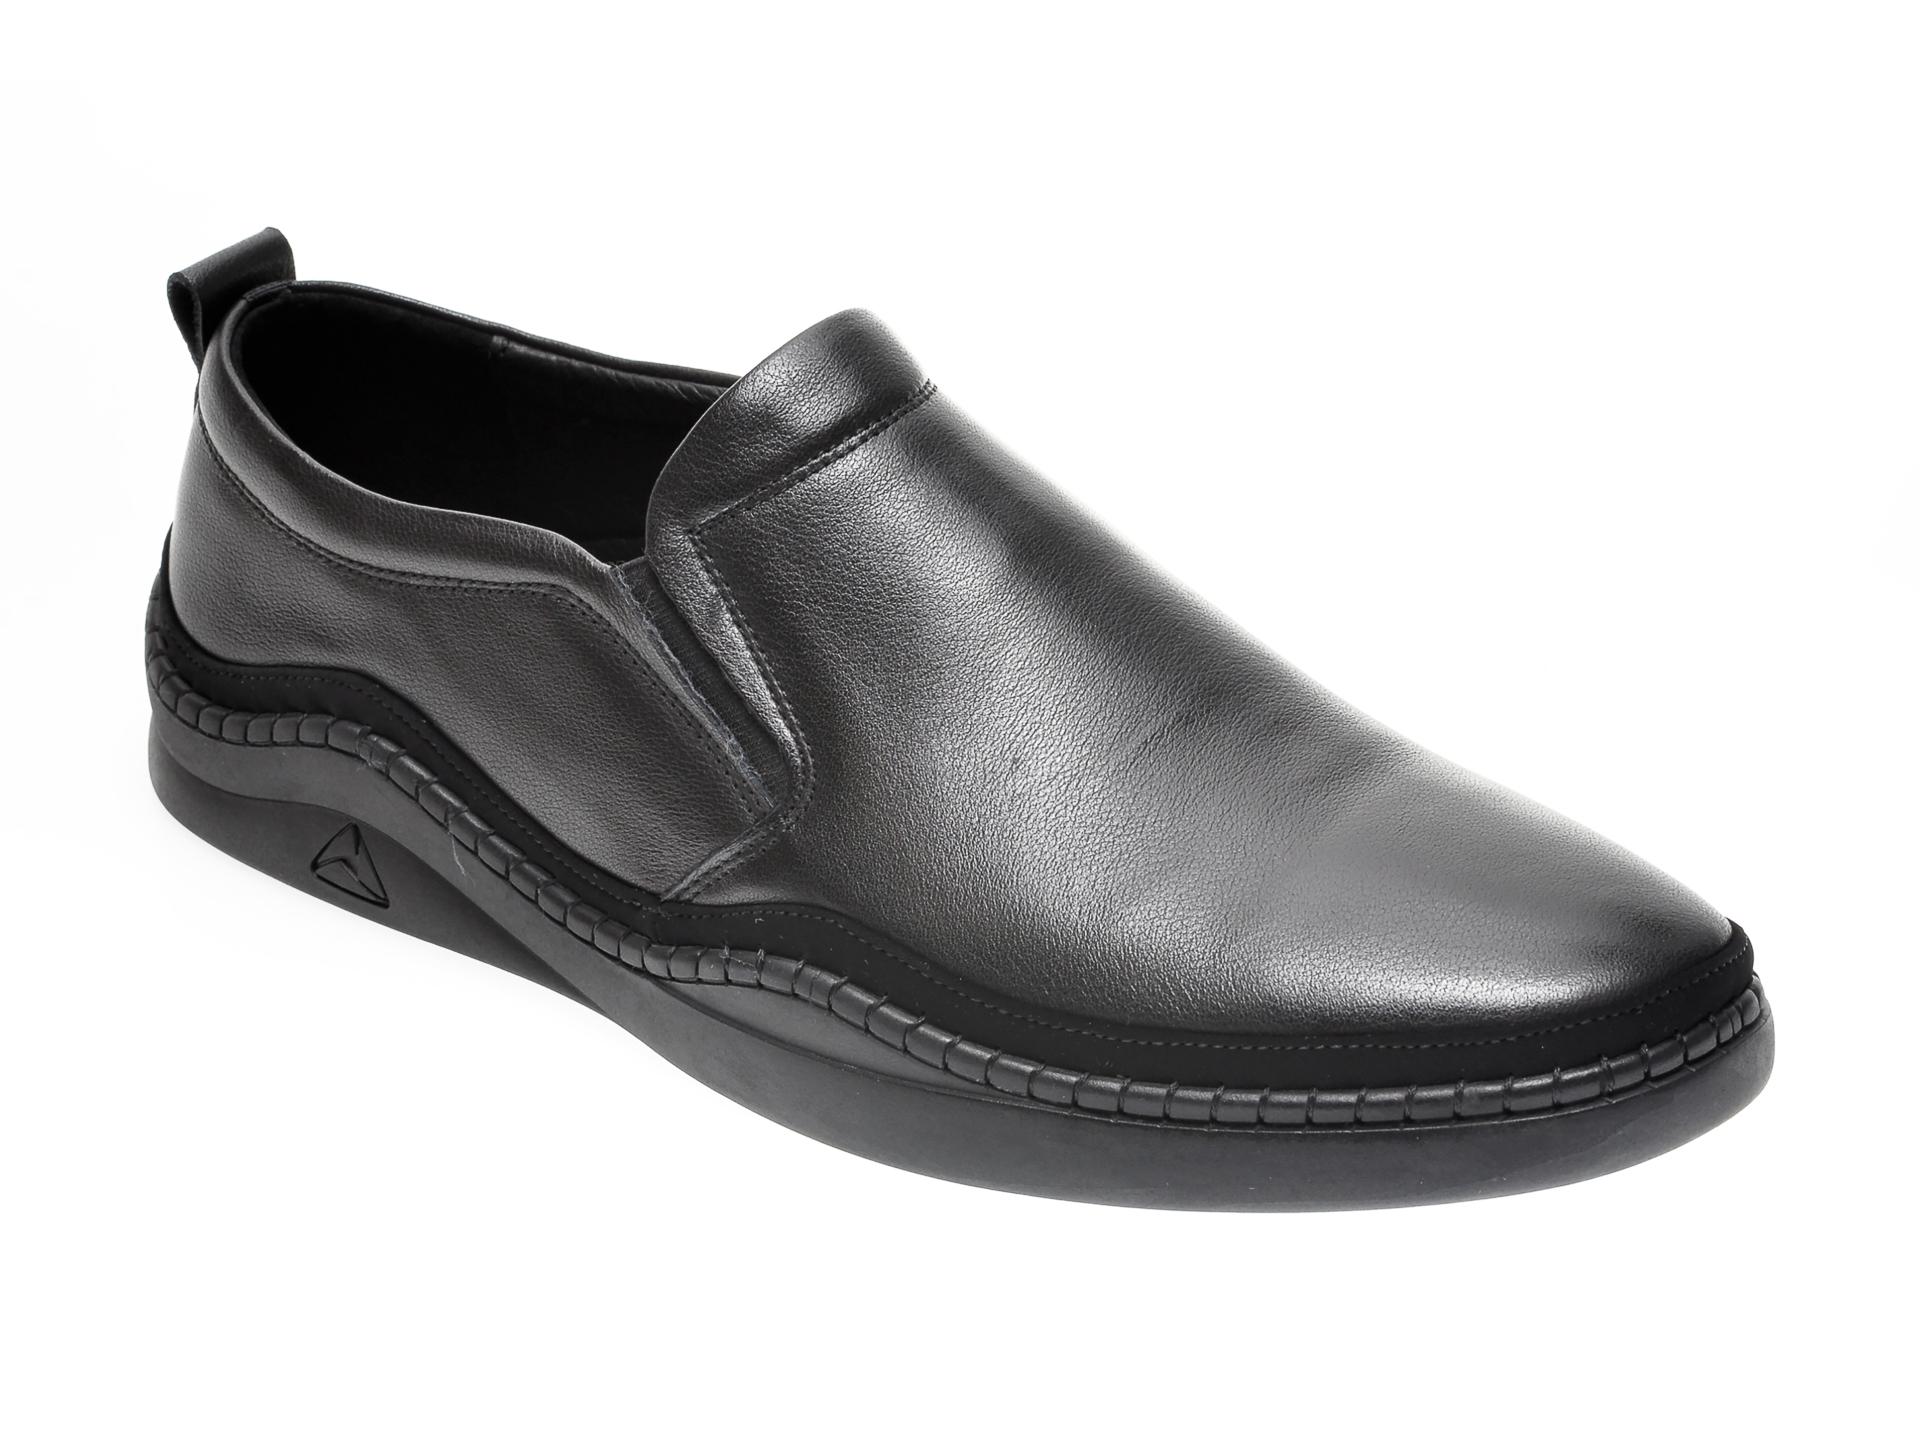 Pantofi OTTER negri, YD01206, din piele naturala New